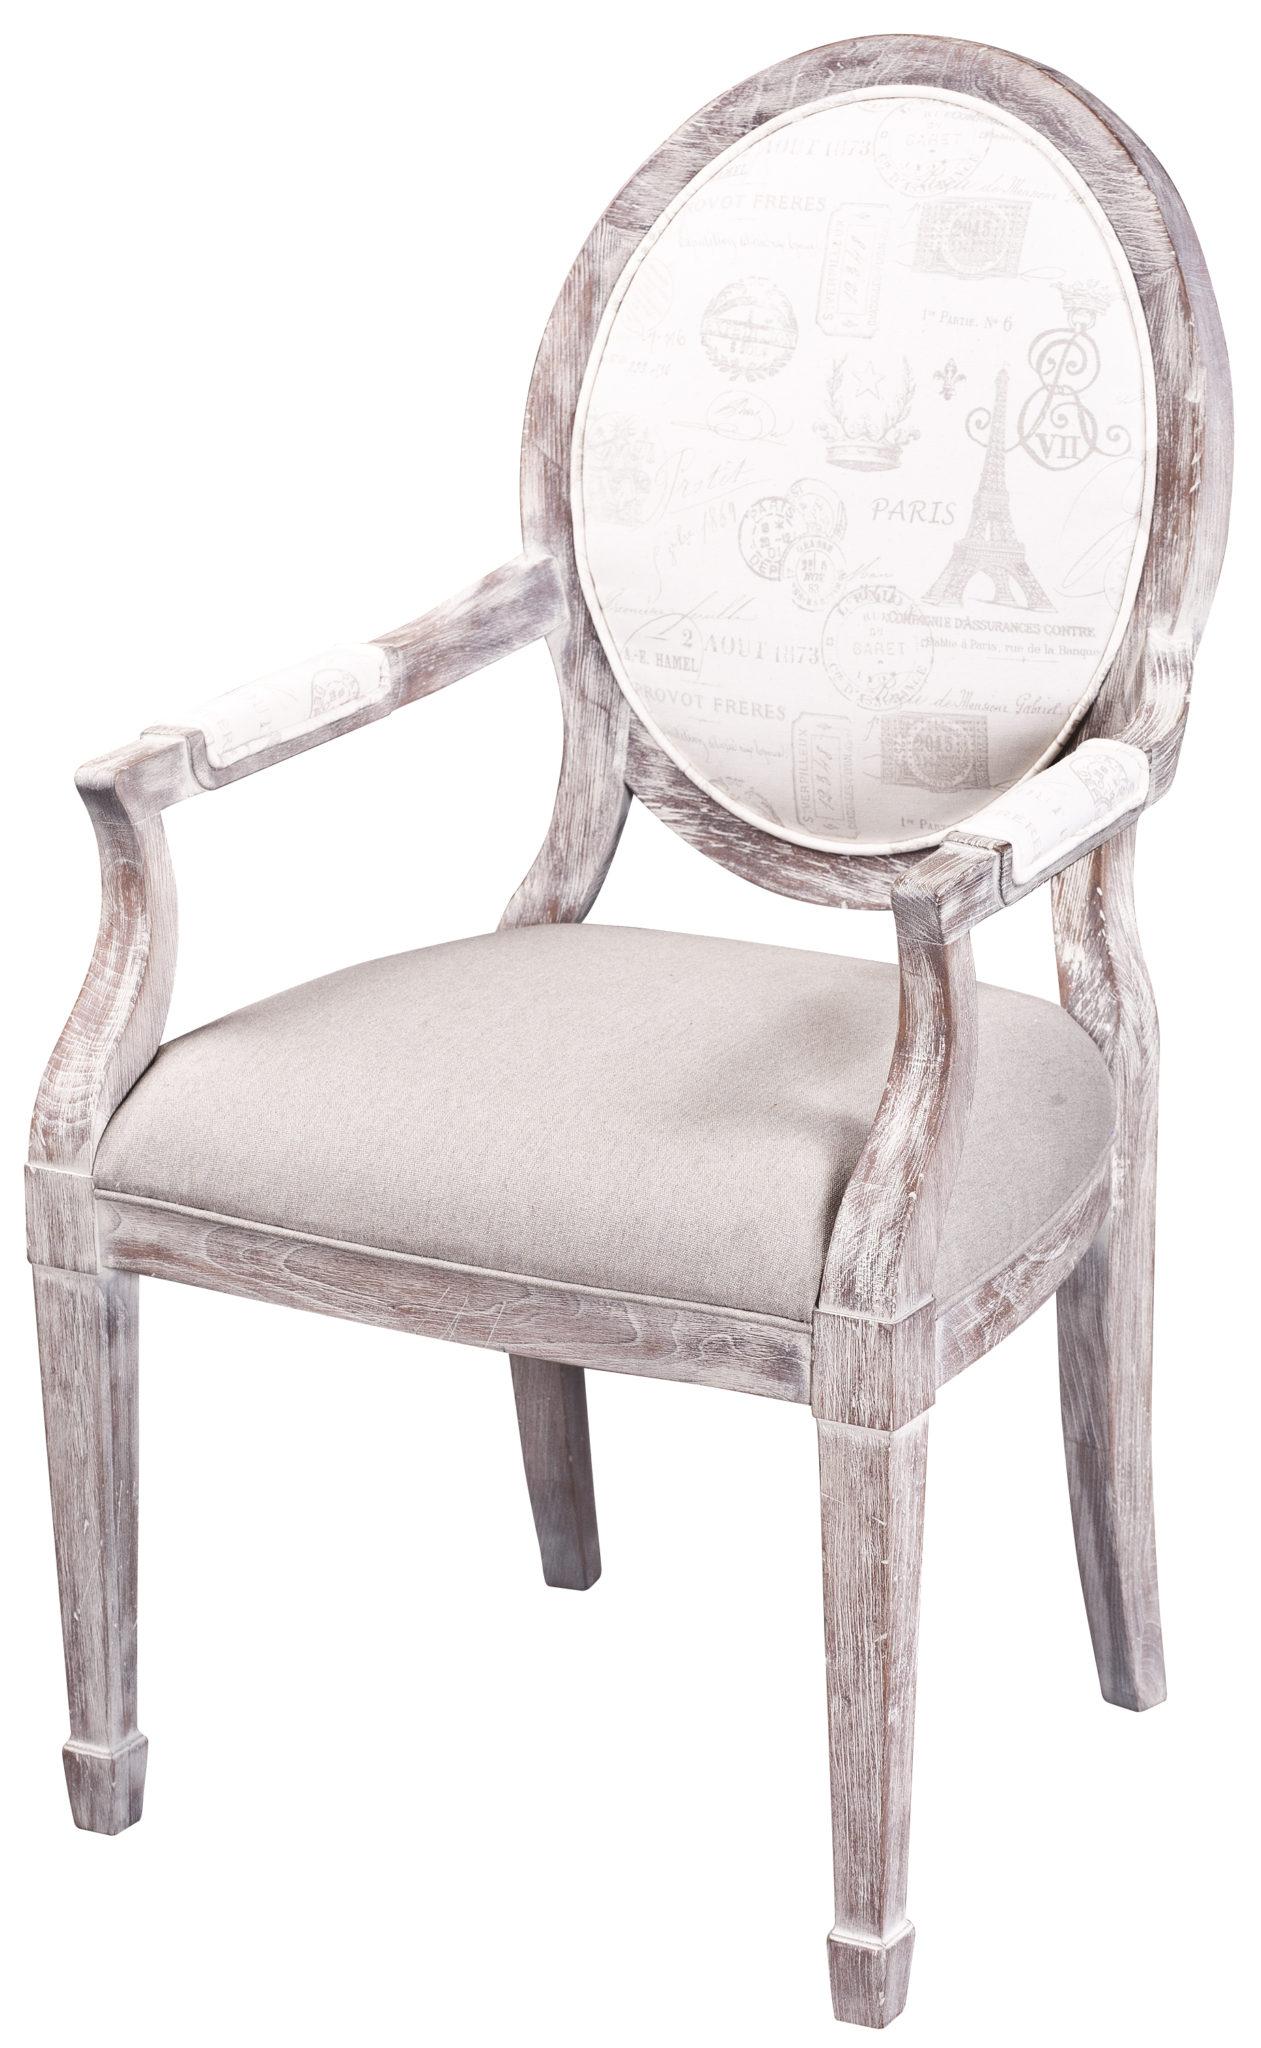 363AU-1-Weathered-Arm-Bayonne-Chair.jpg